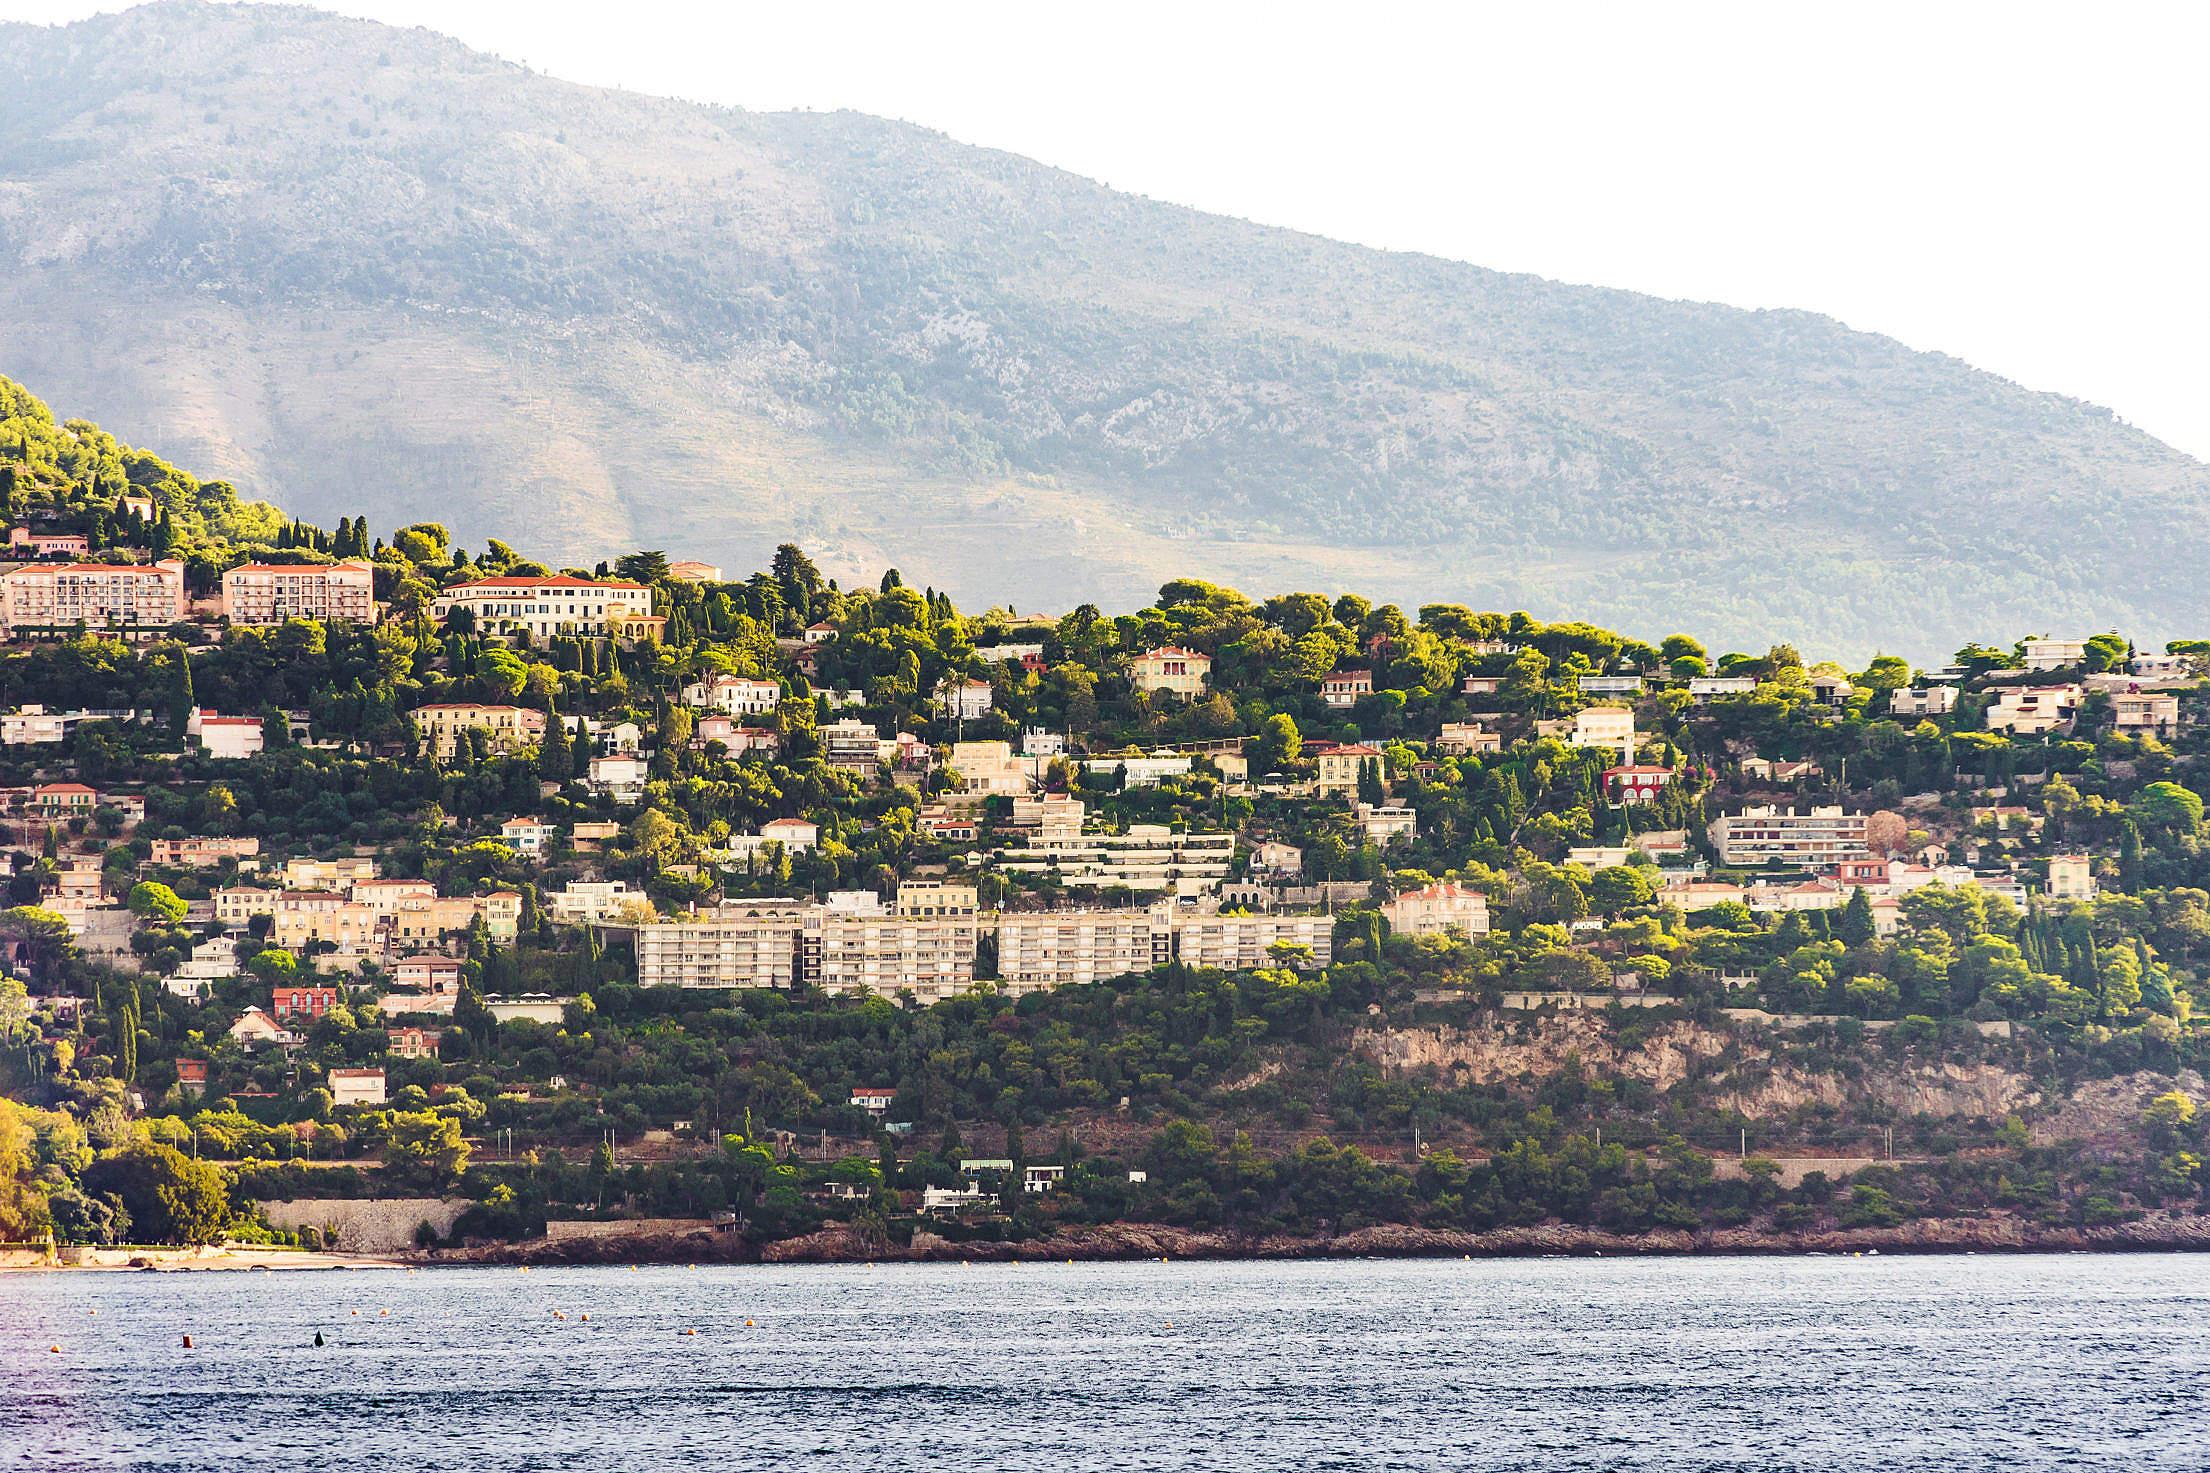 View of Houses Built on Steep Hillside, Monaco Free Stock Photo